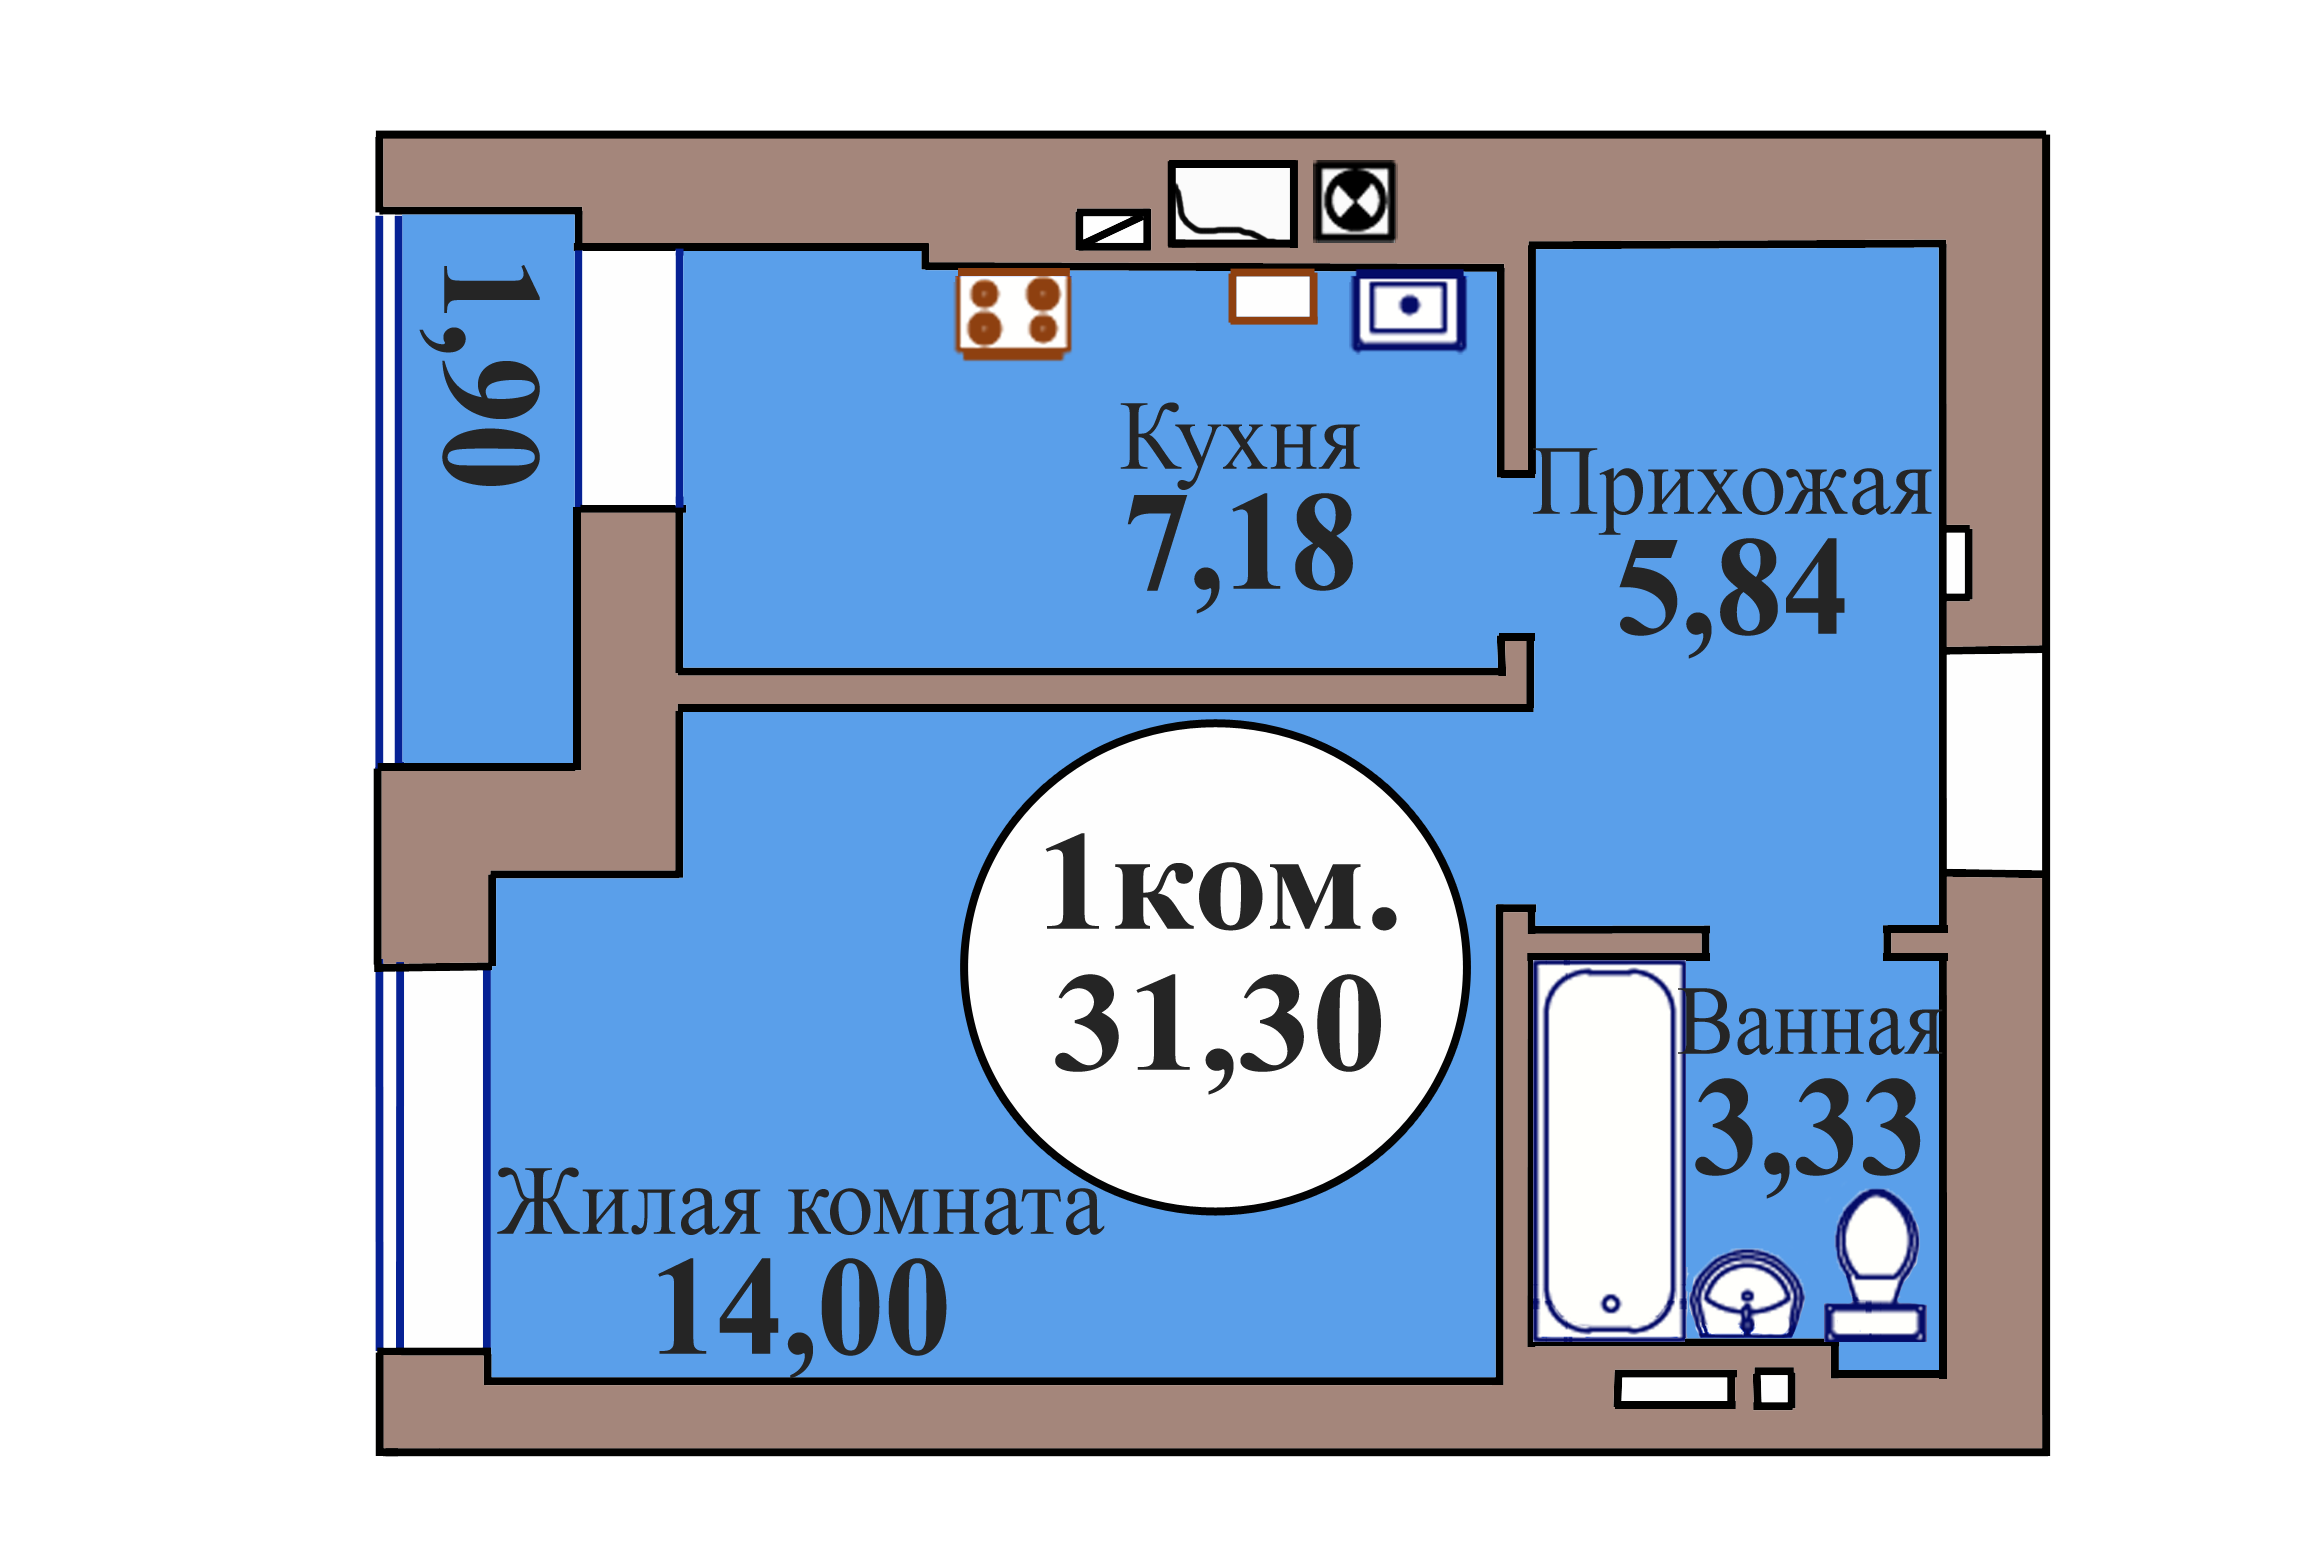 1-комн. кв. по пер. Калининградский, 5 кв. 28 в Калининграде